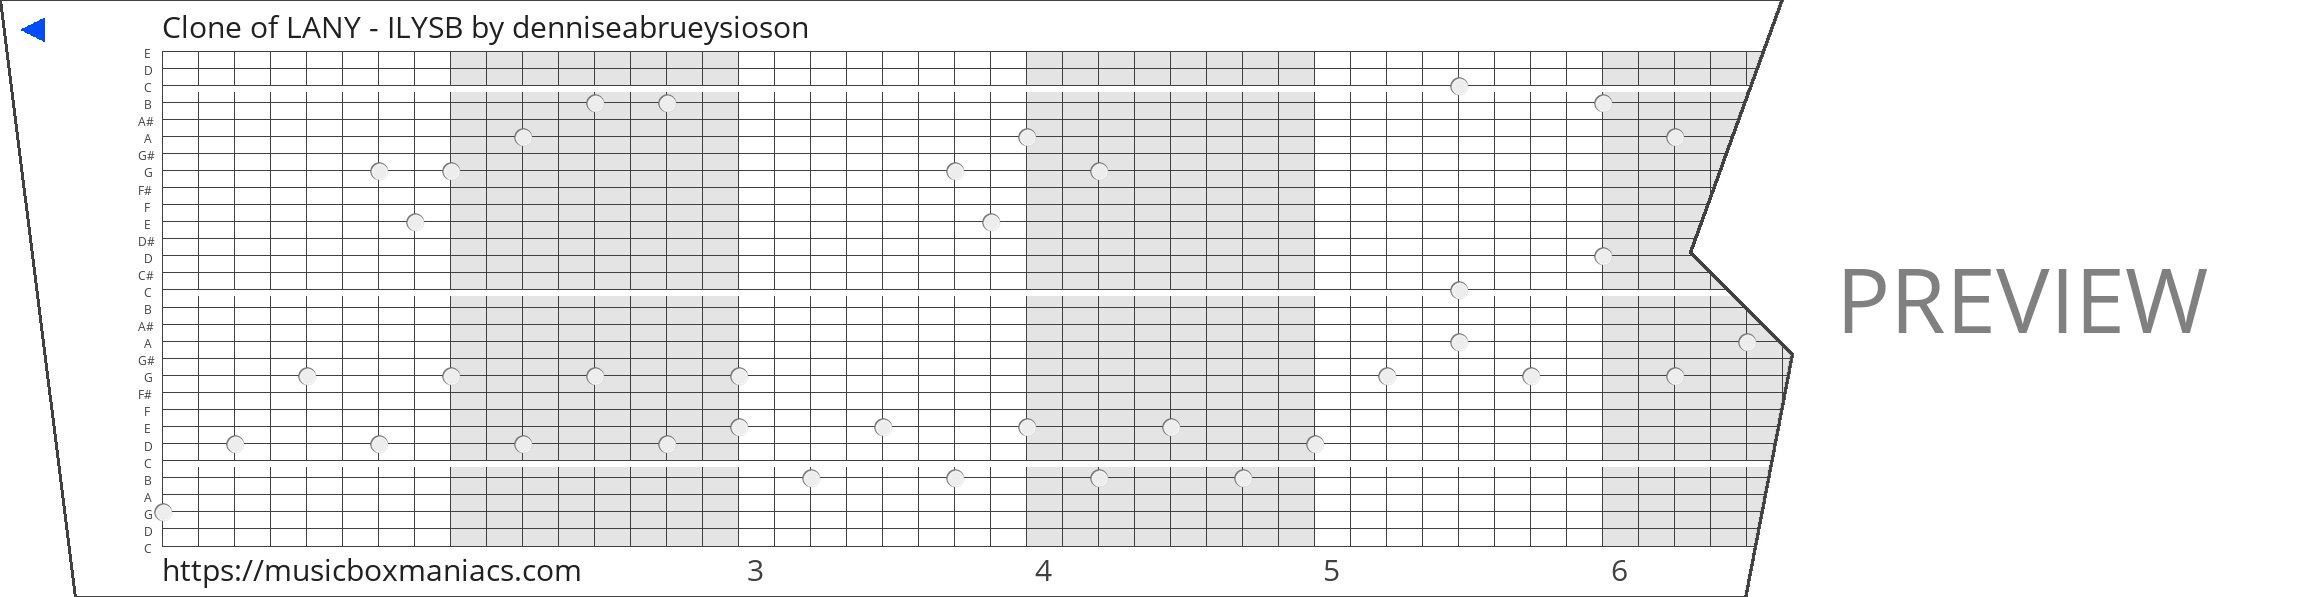 Clone of LANY - ILYSB 30 note music box paper strip